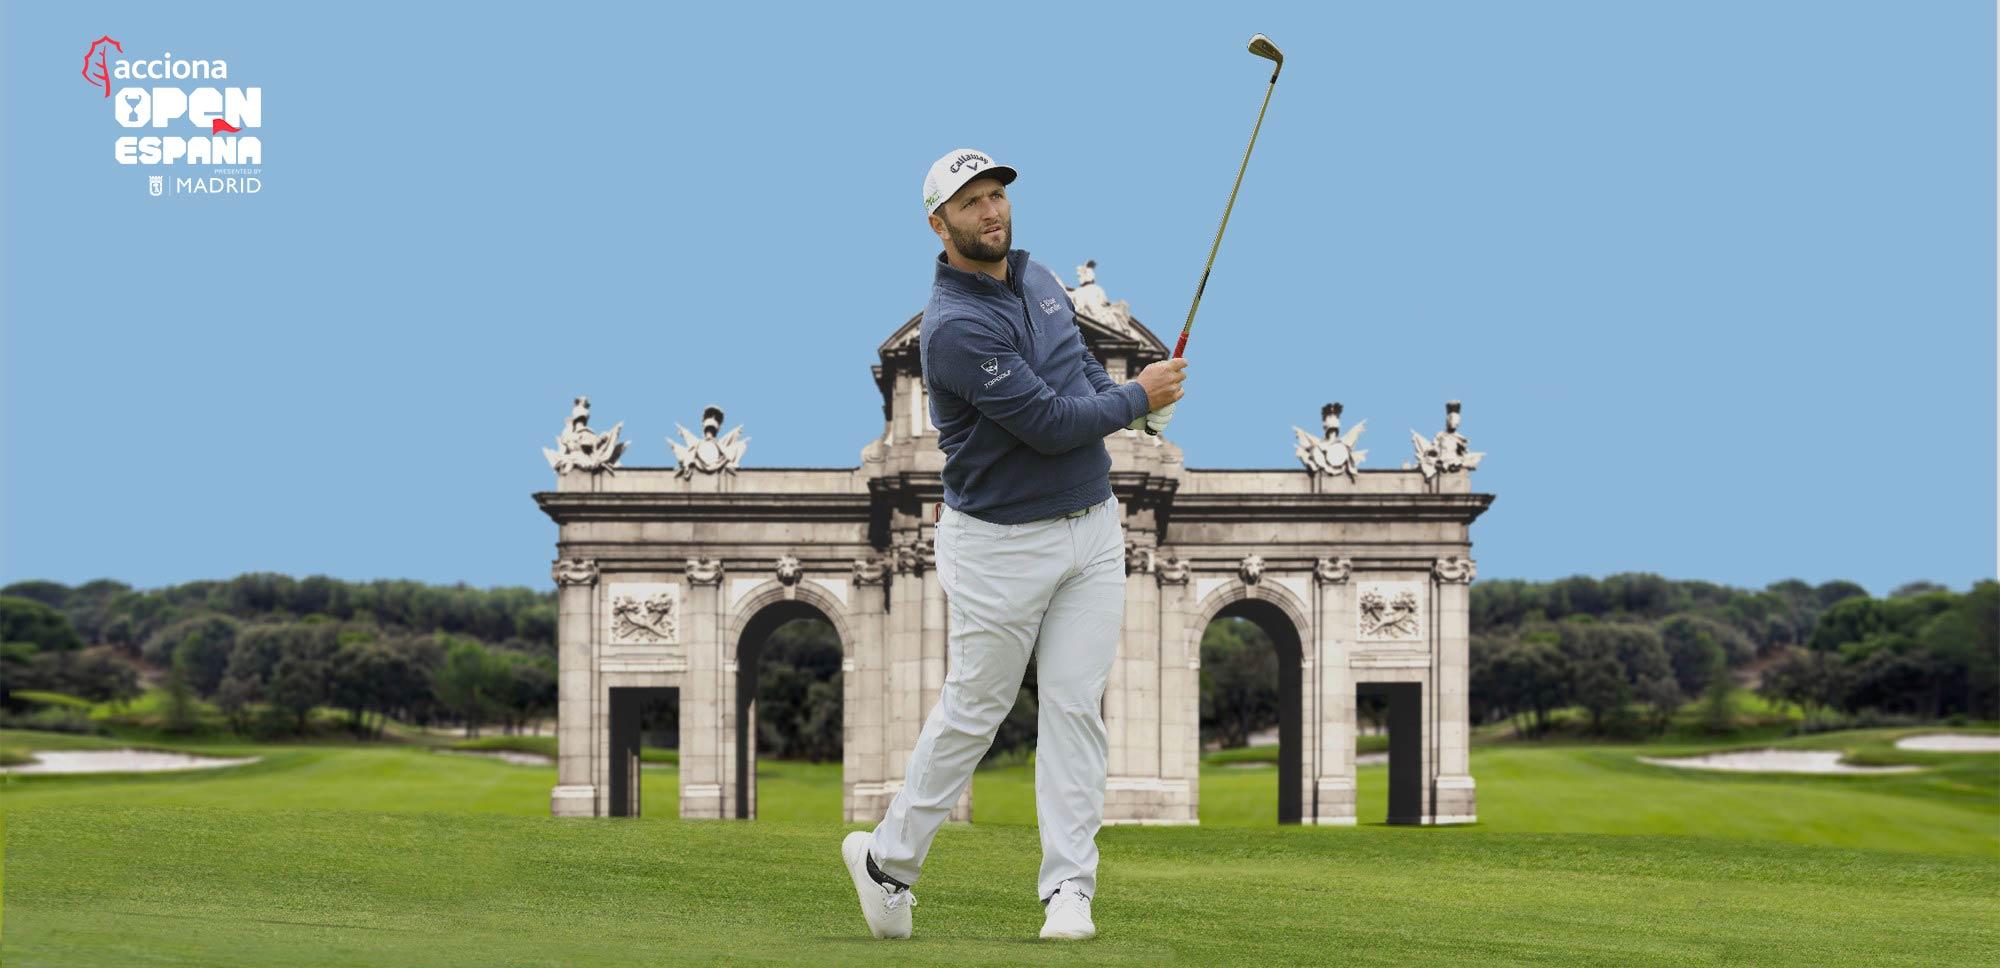 low emissions golf acciona